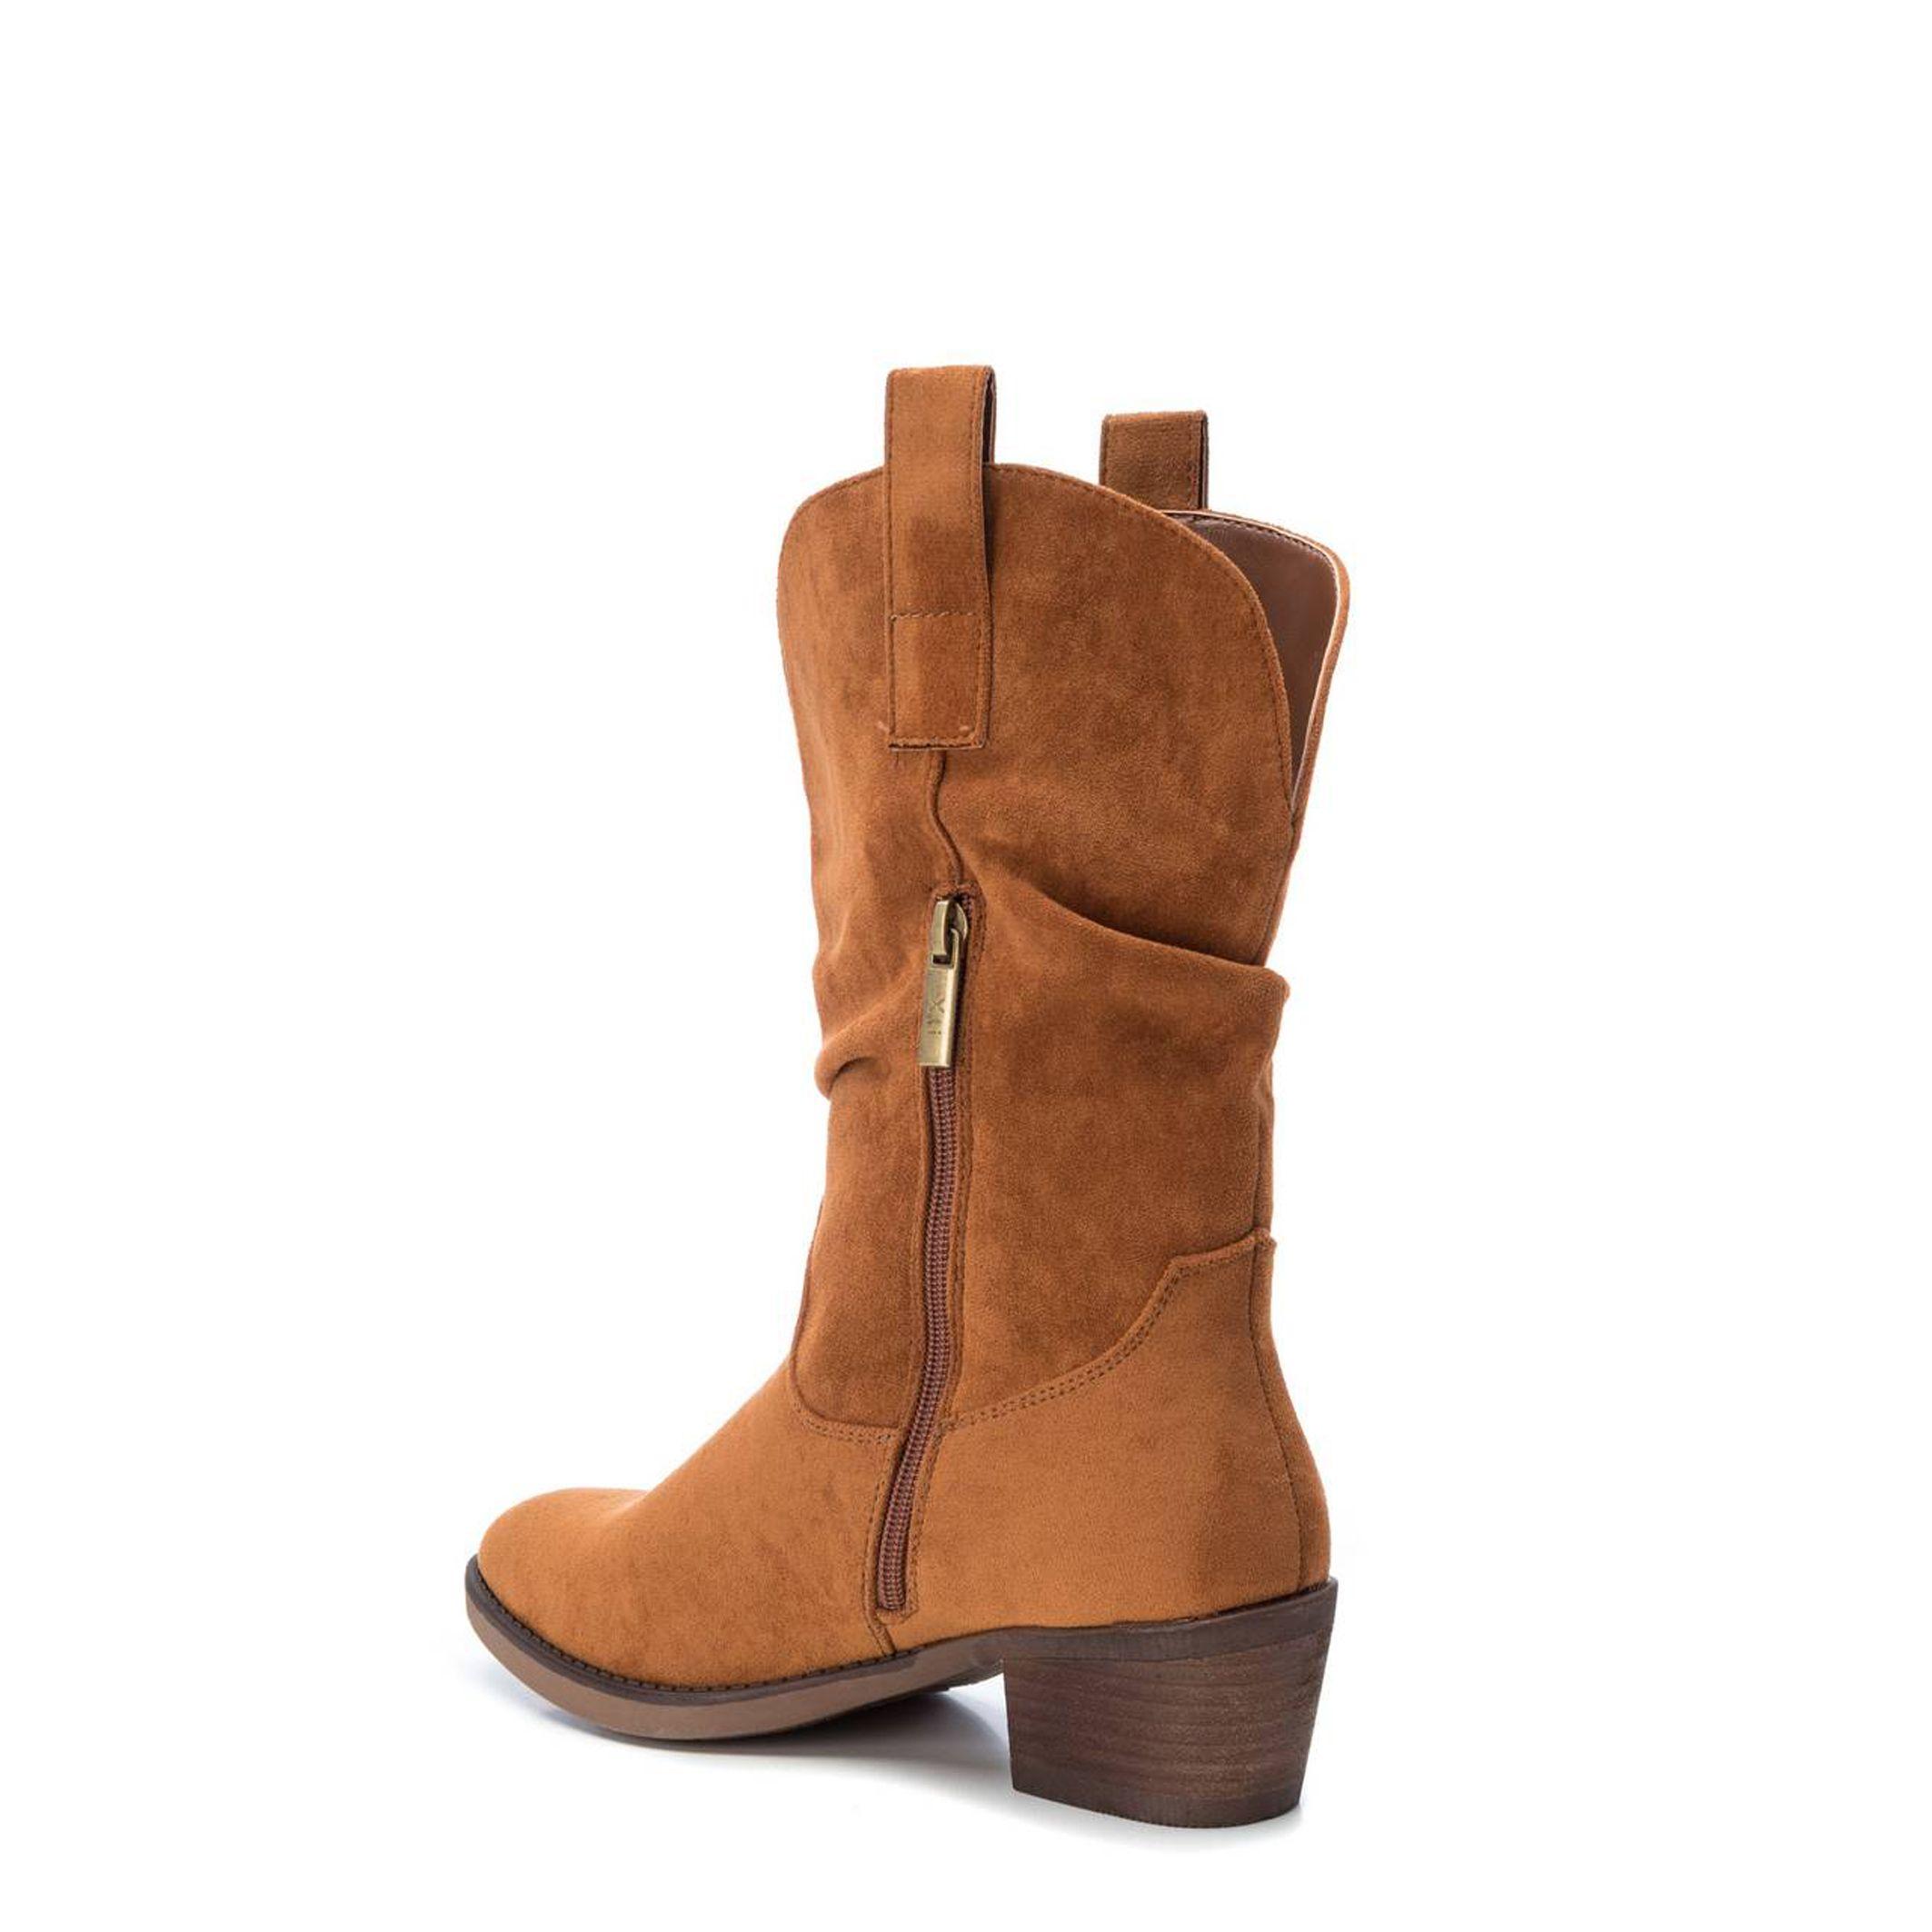 Schuhe Xti – 49475 – Braun